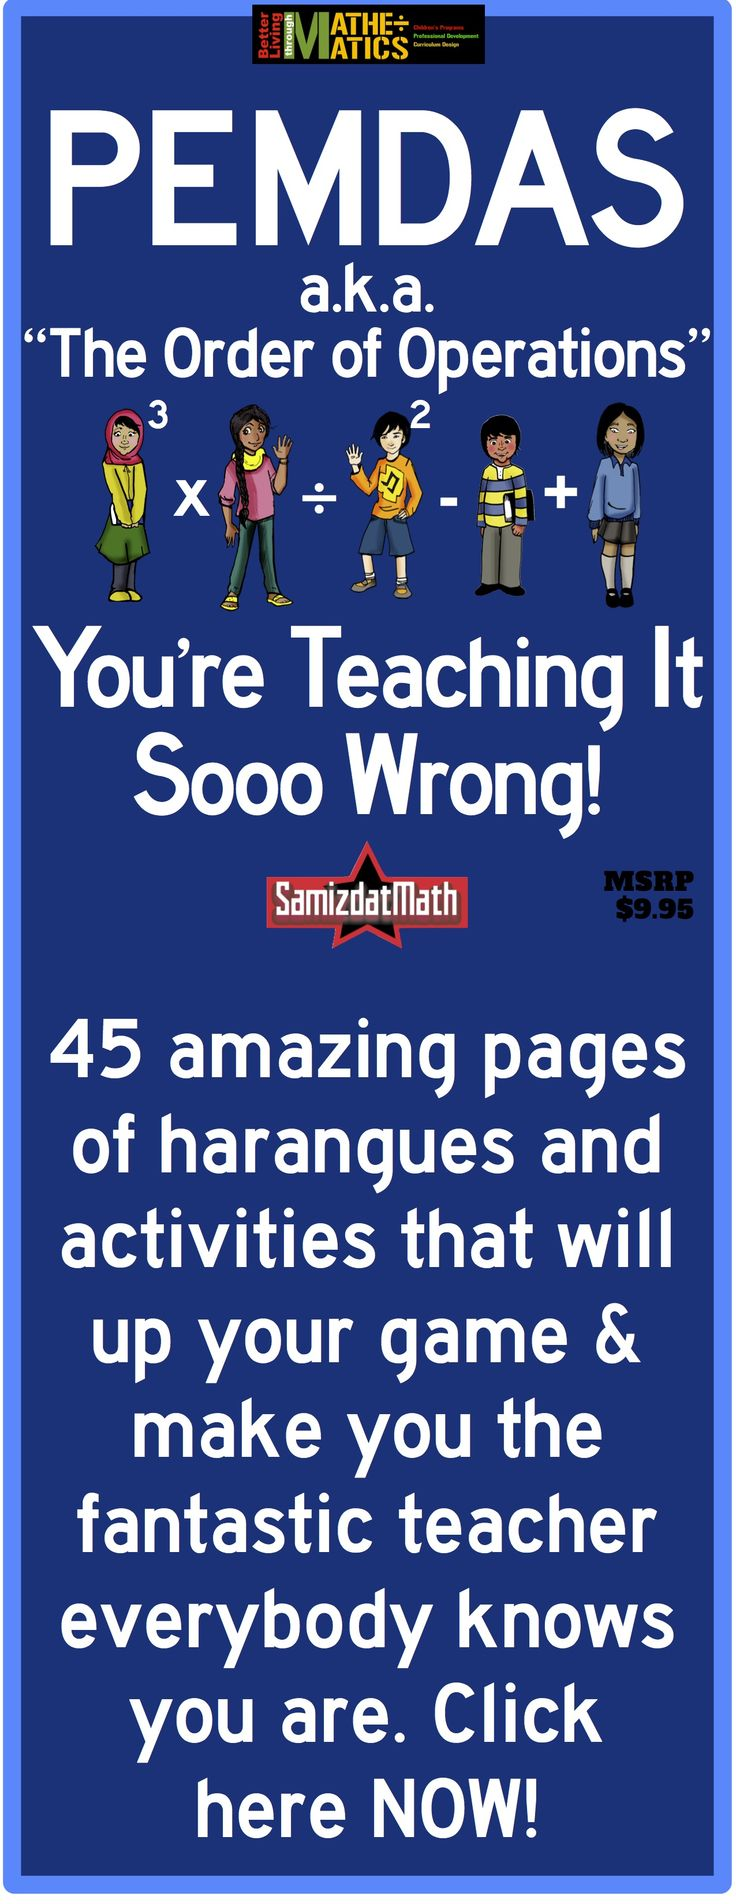 Classroom Organization Ideas Pictures ~ Order of operations pemdas you re teaching it sooooo